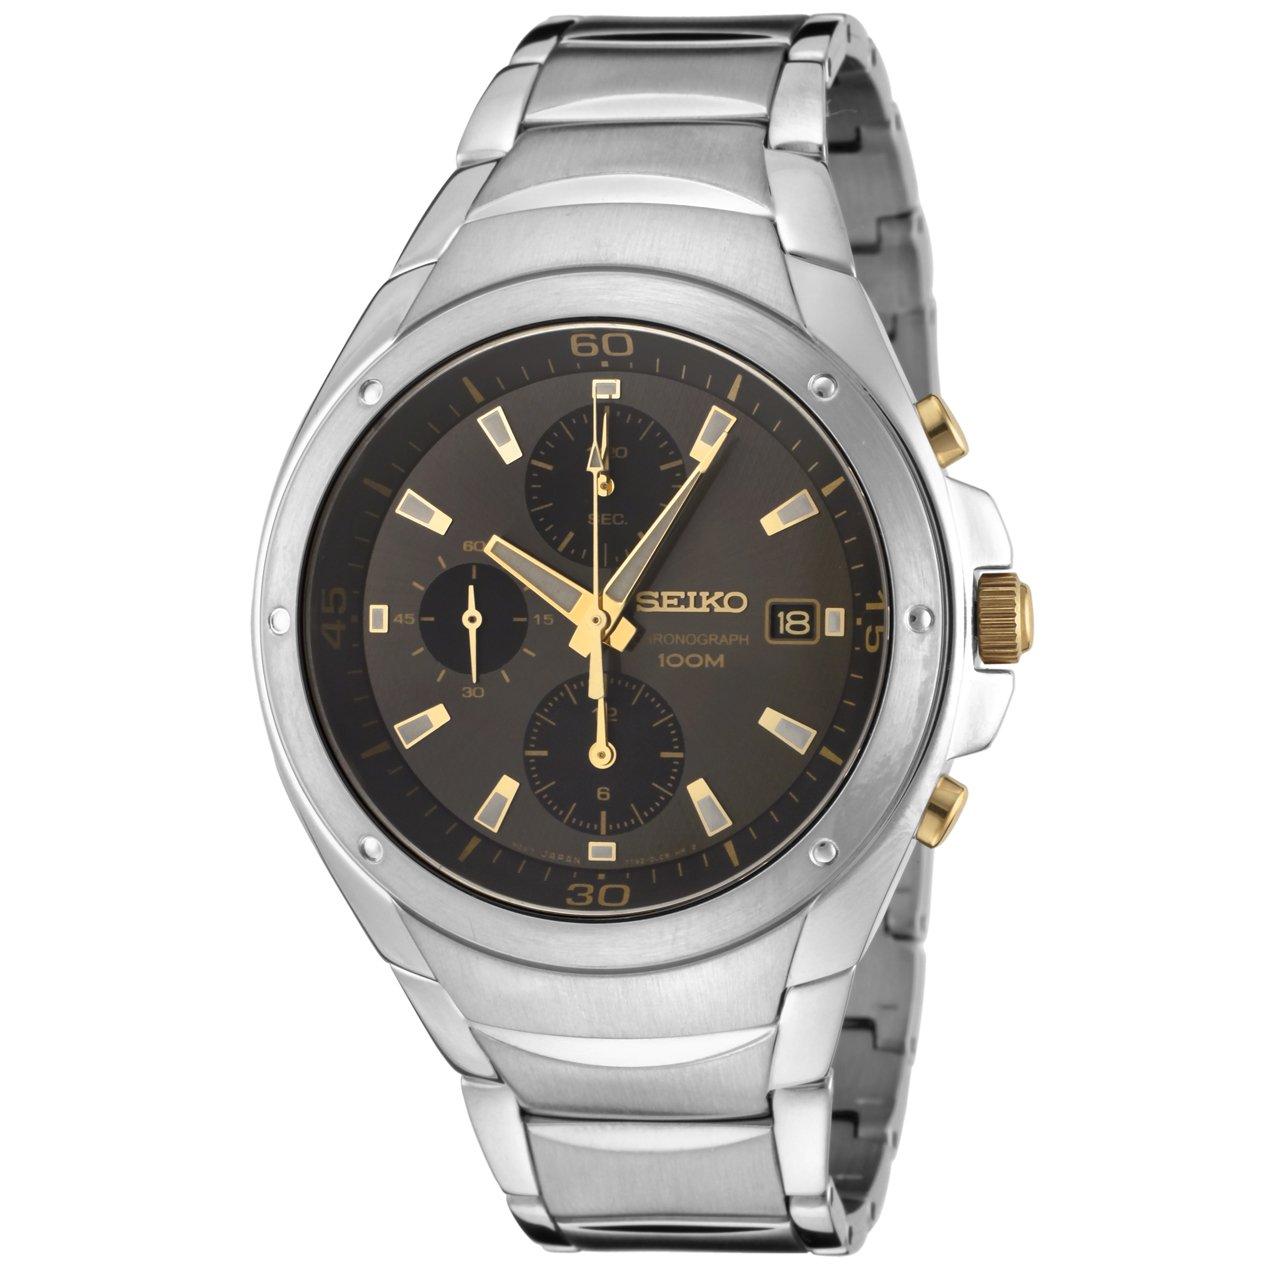 Seiko Men s SND783P Chronograph Black Dial Stainless Steel Watch